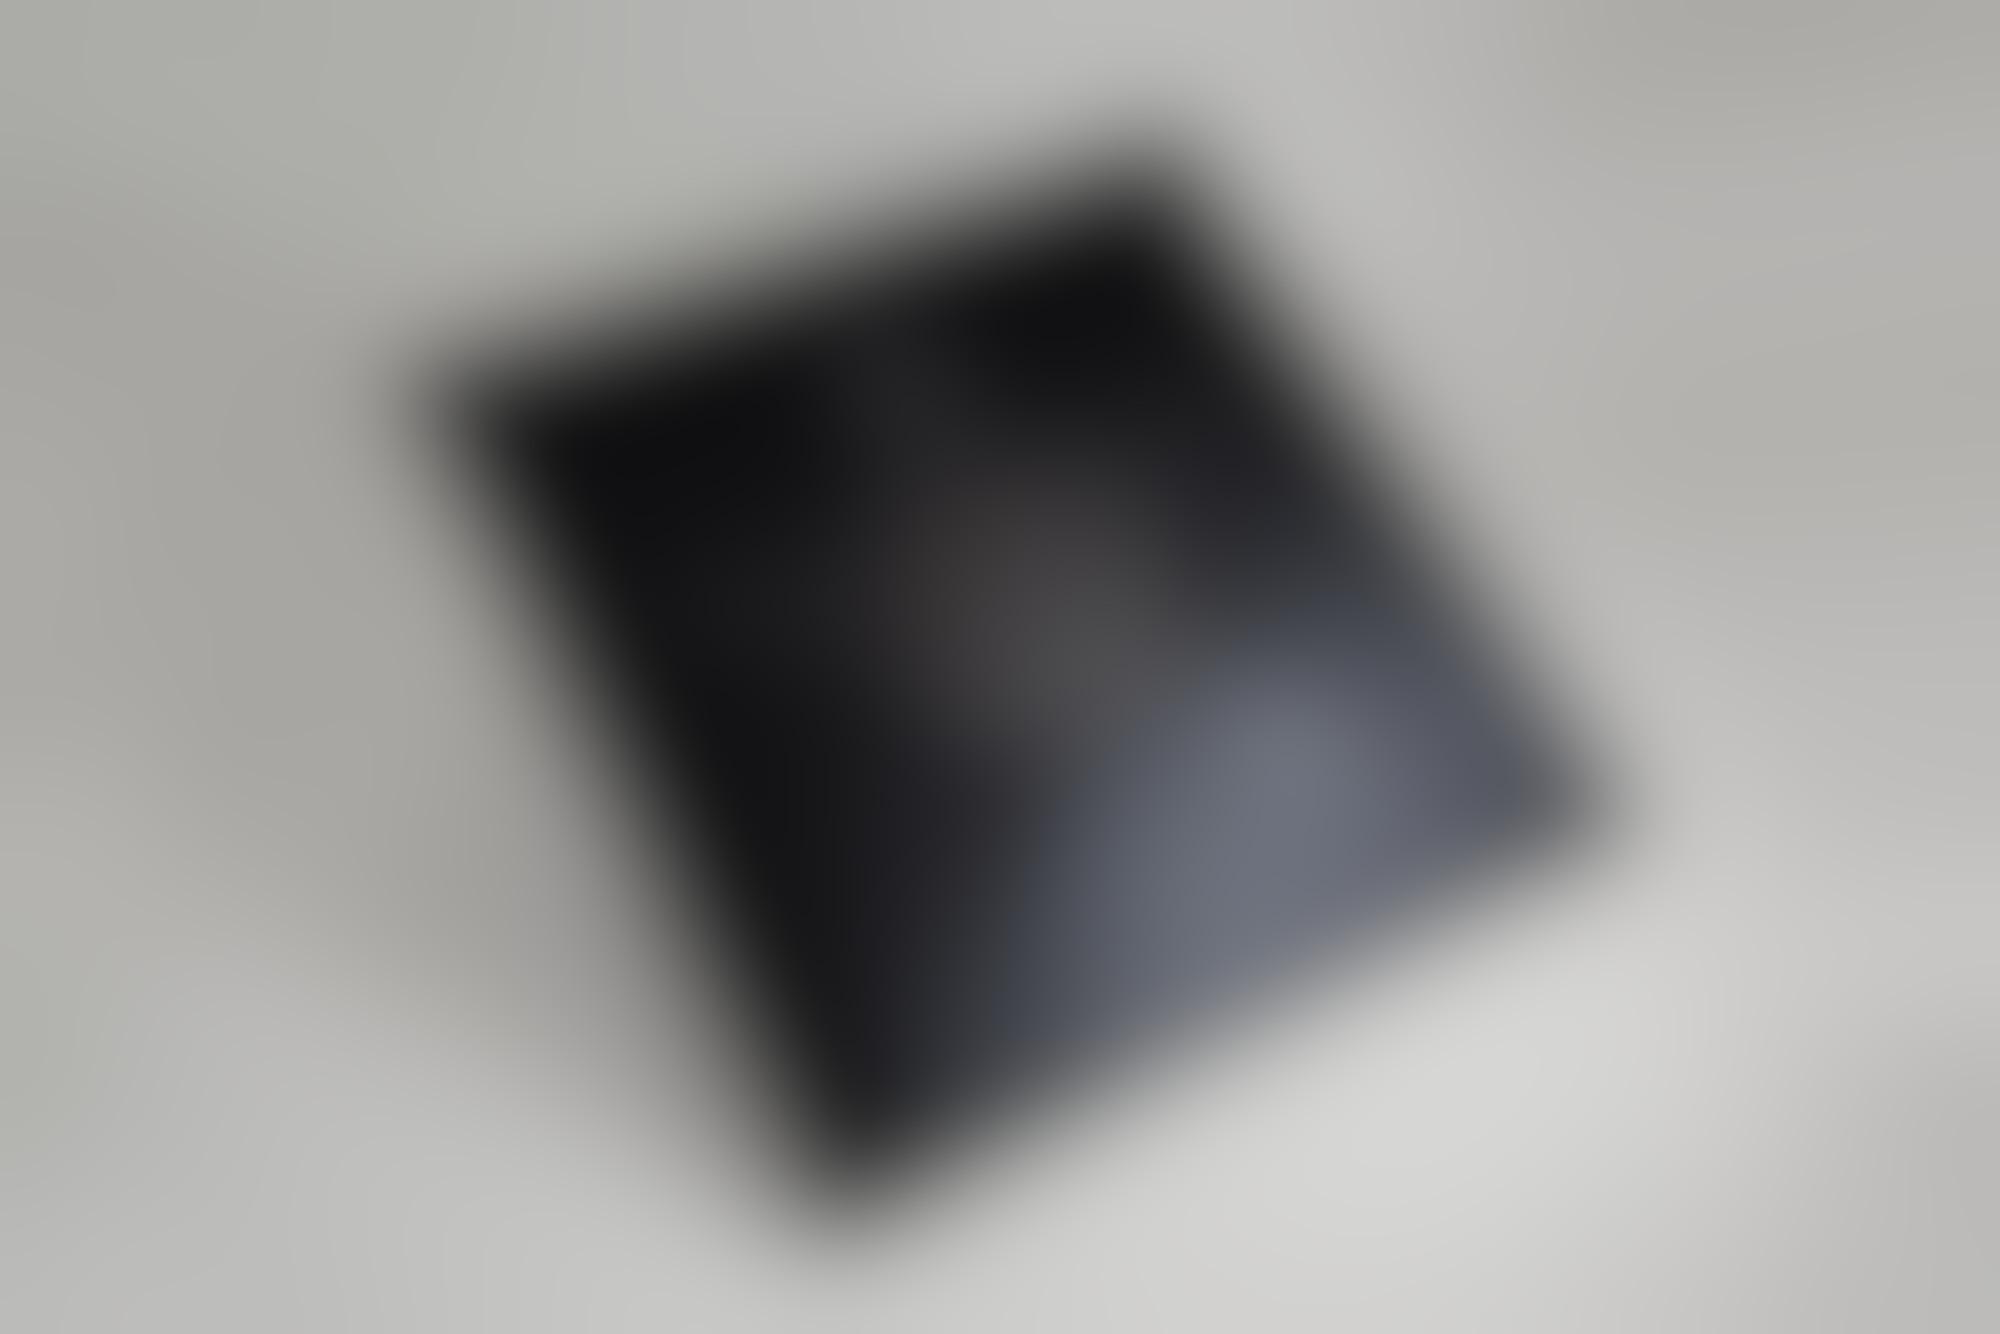 DB Blackstar 01 1000x667 autocompressfitresizeixlibphp 1 1 0max h2000max w3 D2000q80s249c1662f059d46c0eb07de5b68e938c